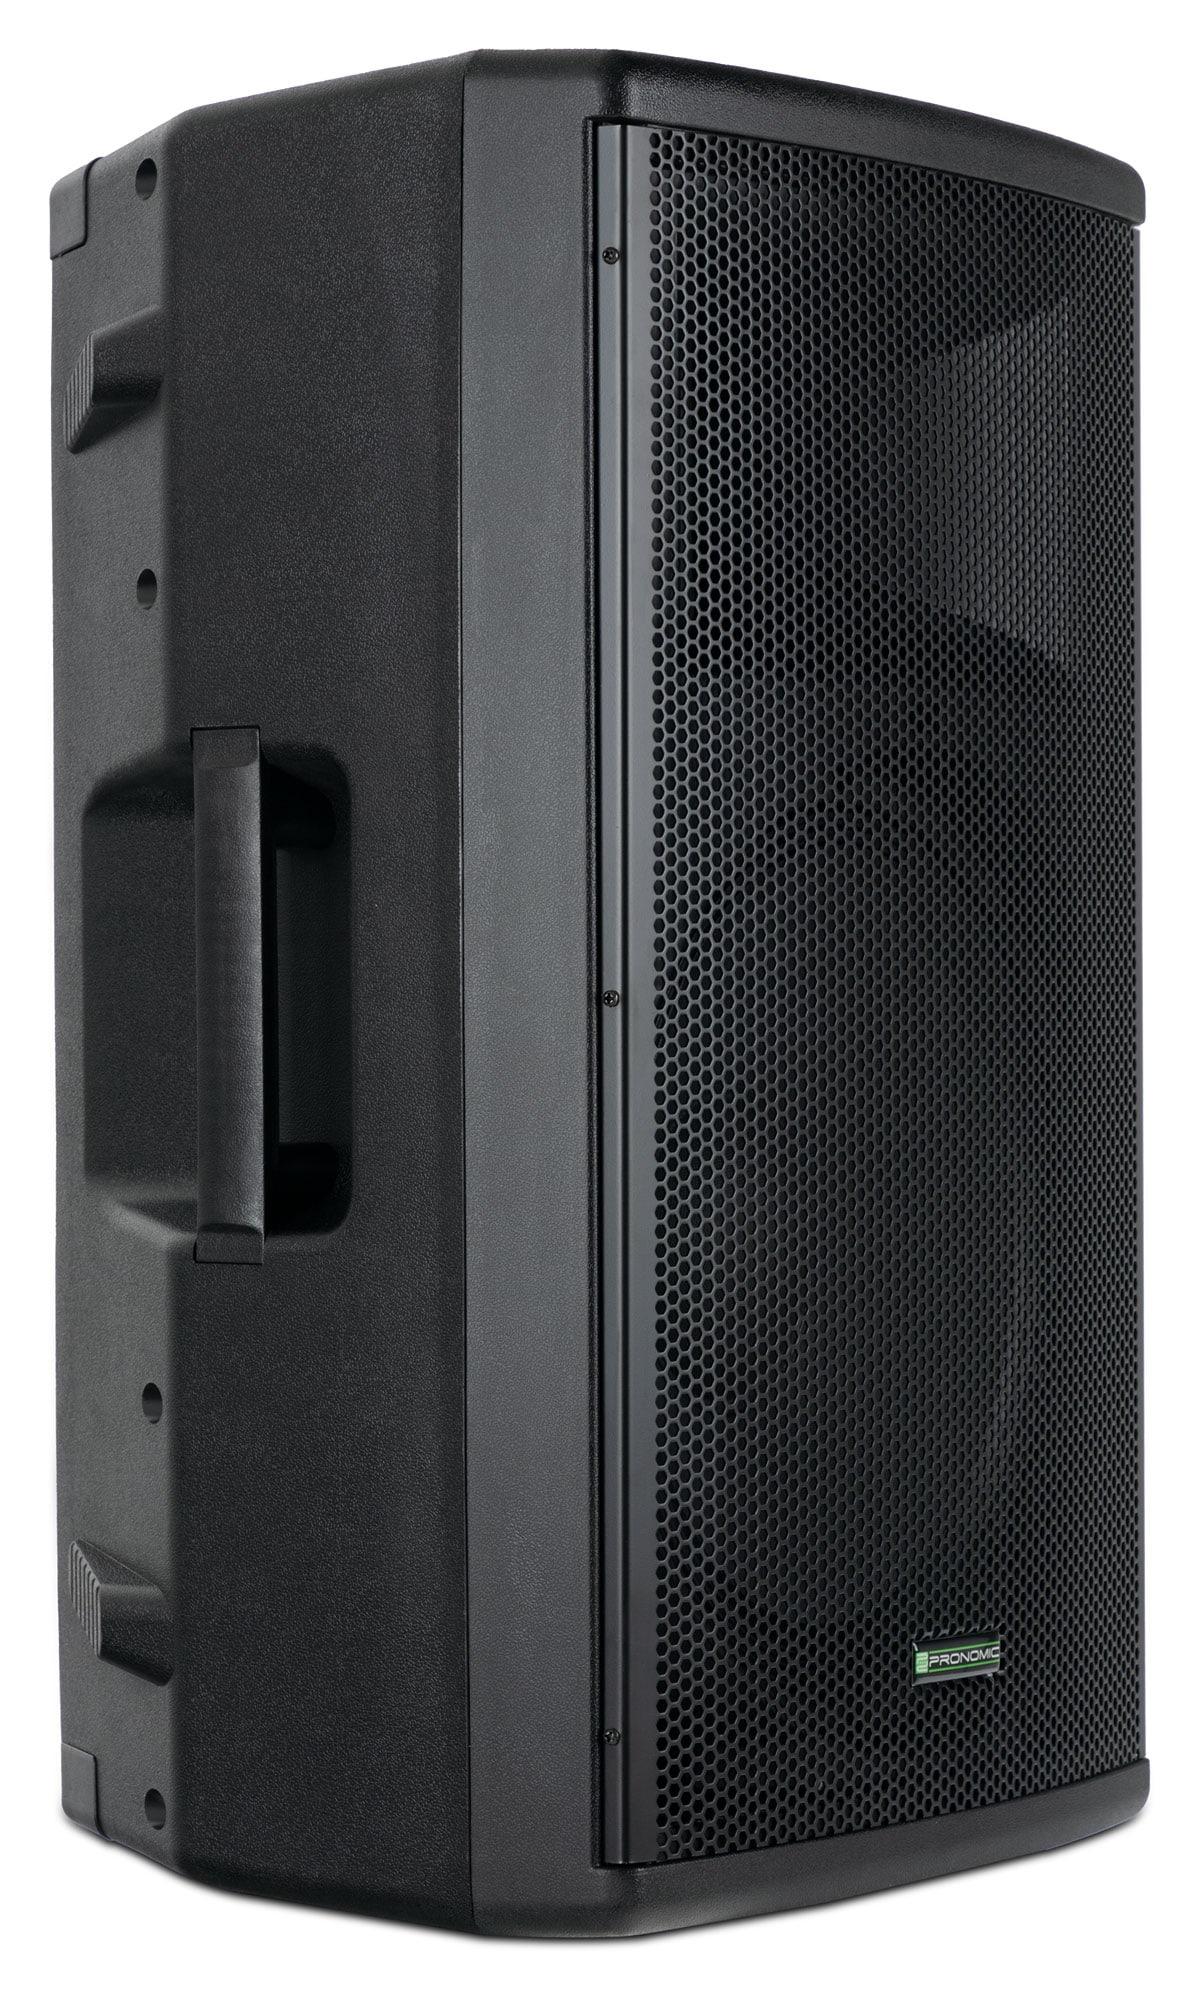 Paendstufen - Pronomic E 215 MA 15' Aktivbox 250 Watt Retoure (Zustand gut) - Onlineshop Musikhaus Kirstein